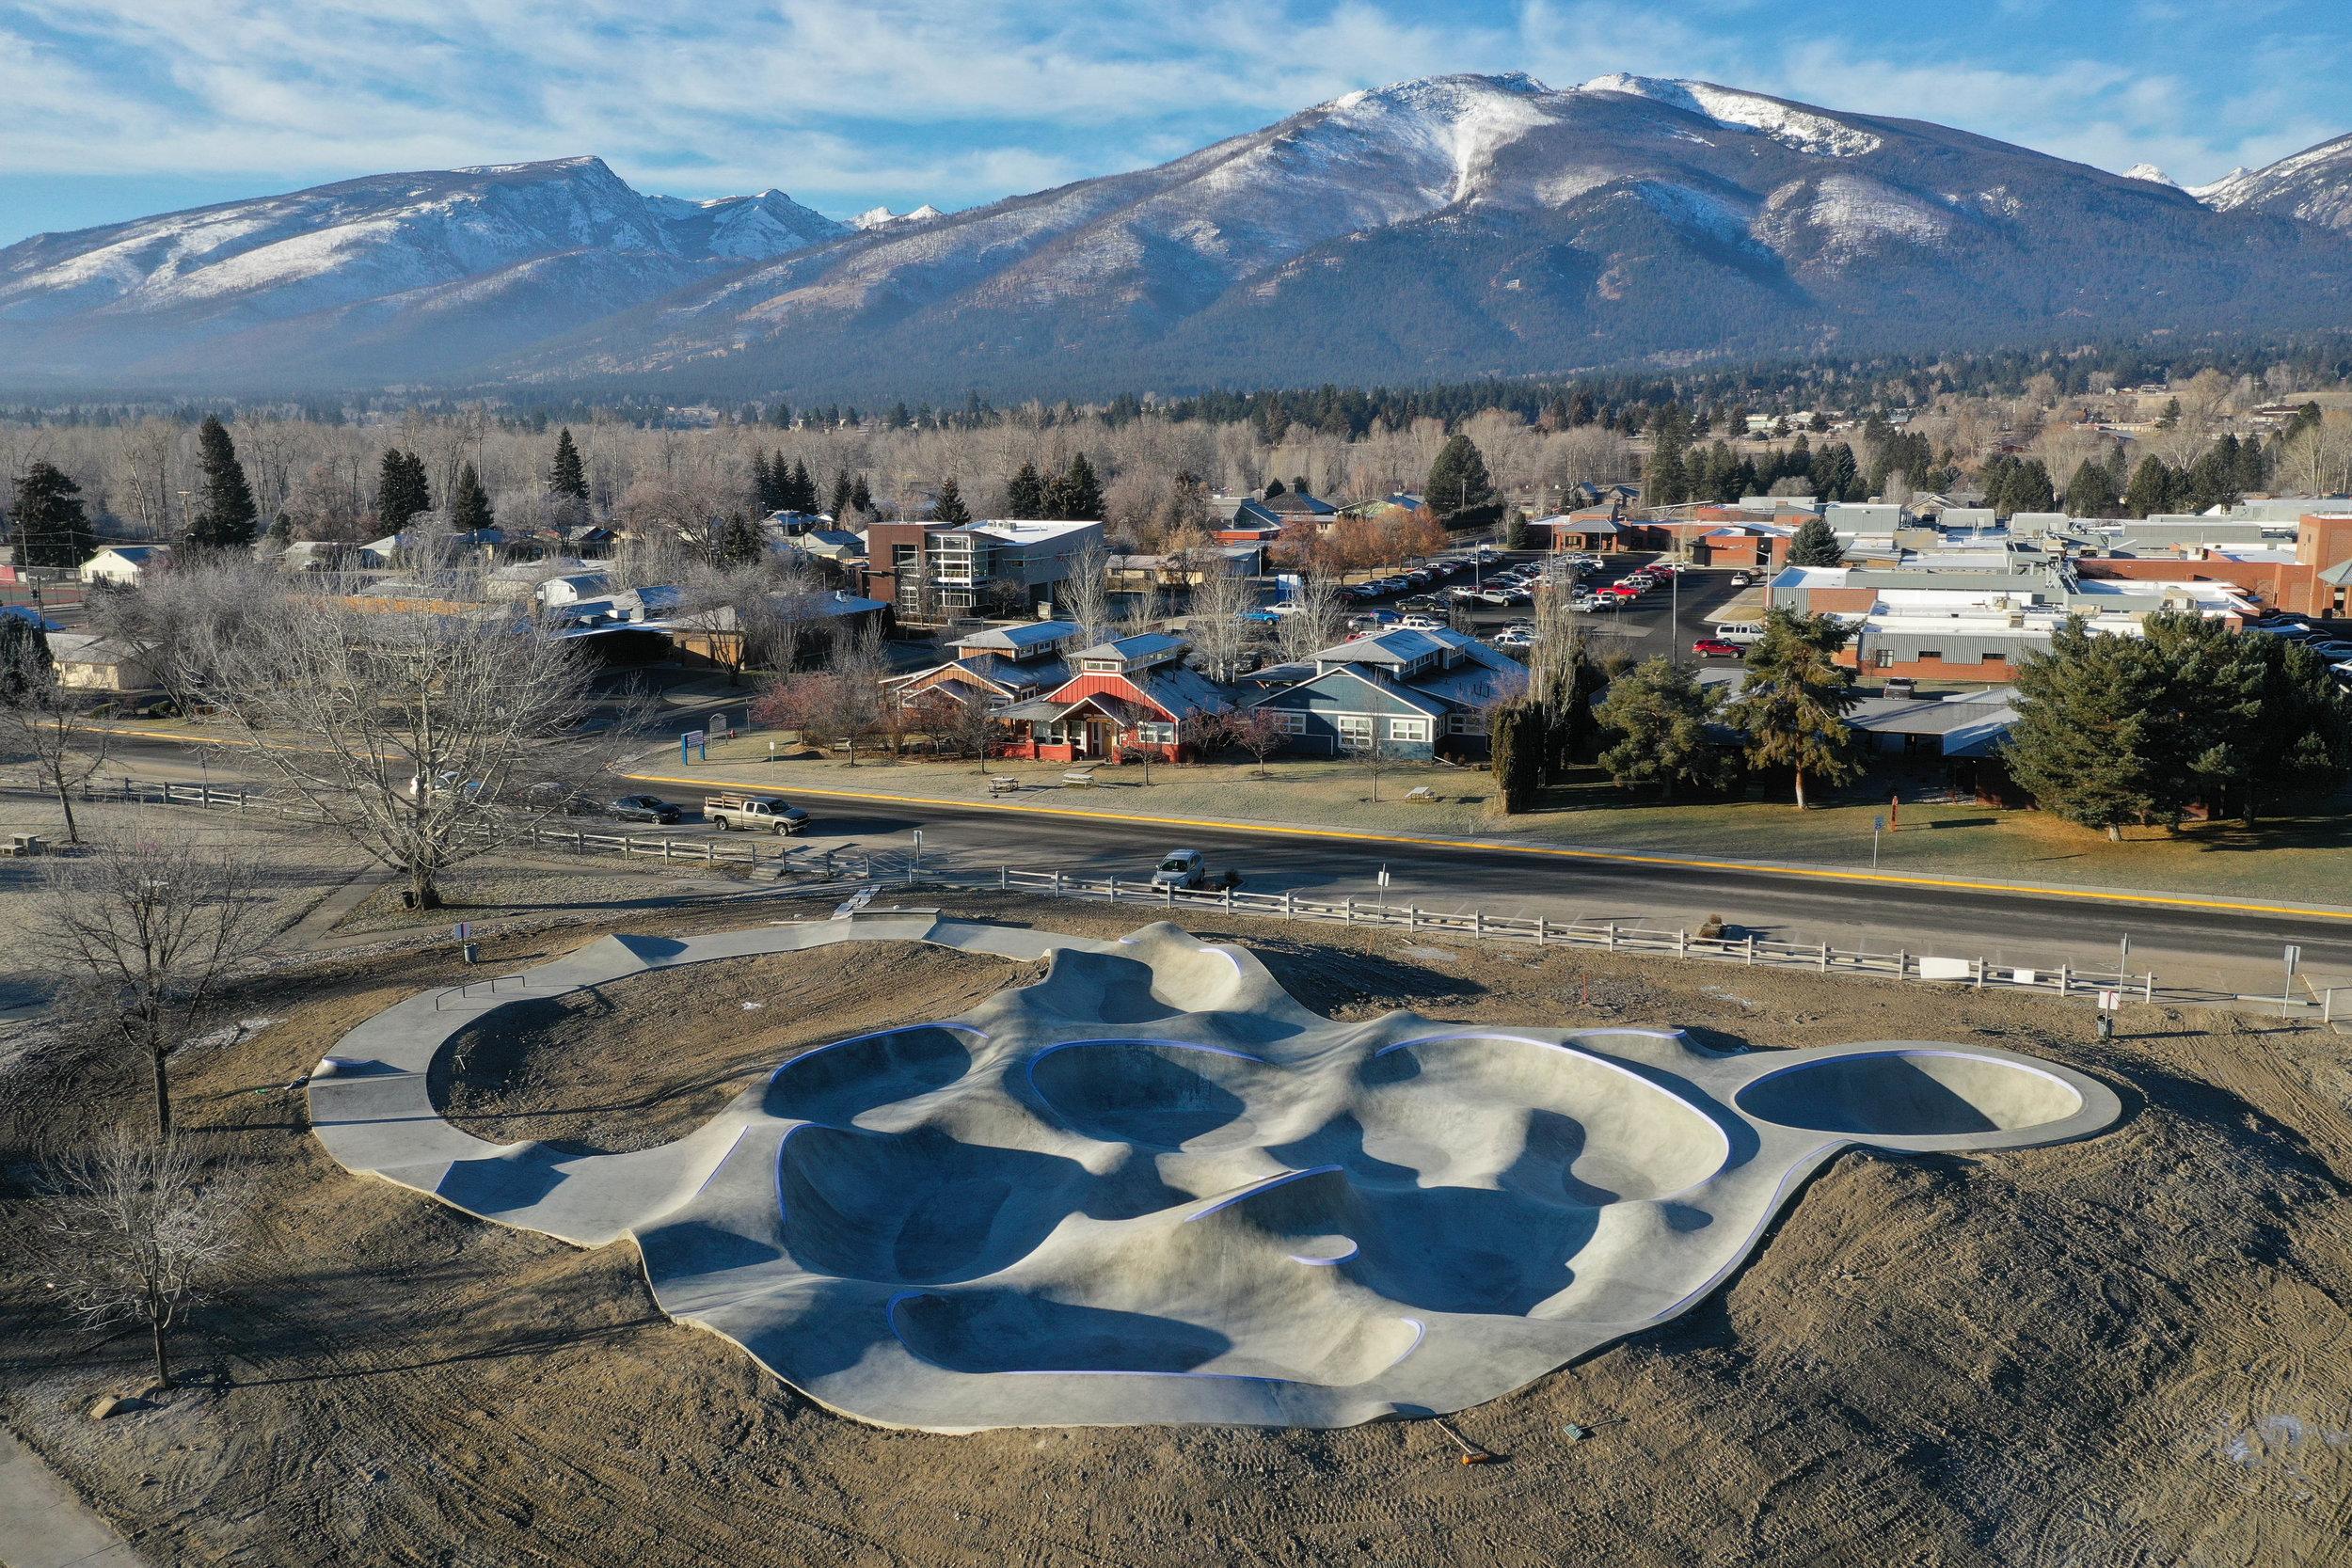 Hamilton, Montana 💥 Grand opening success today 🙌🏽